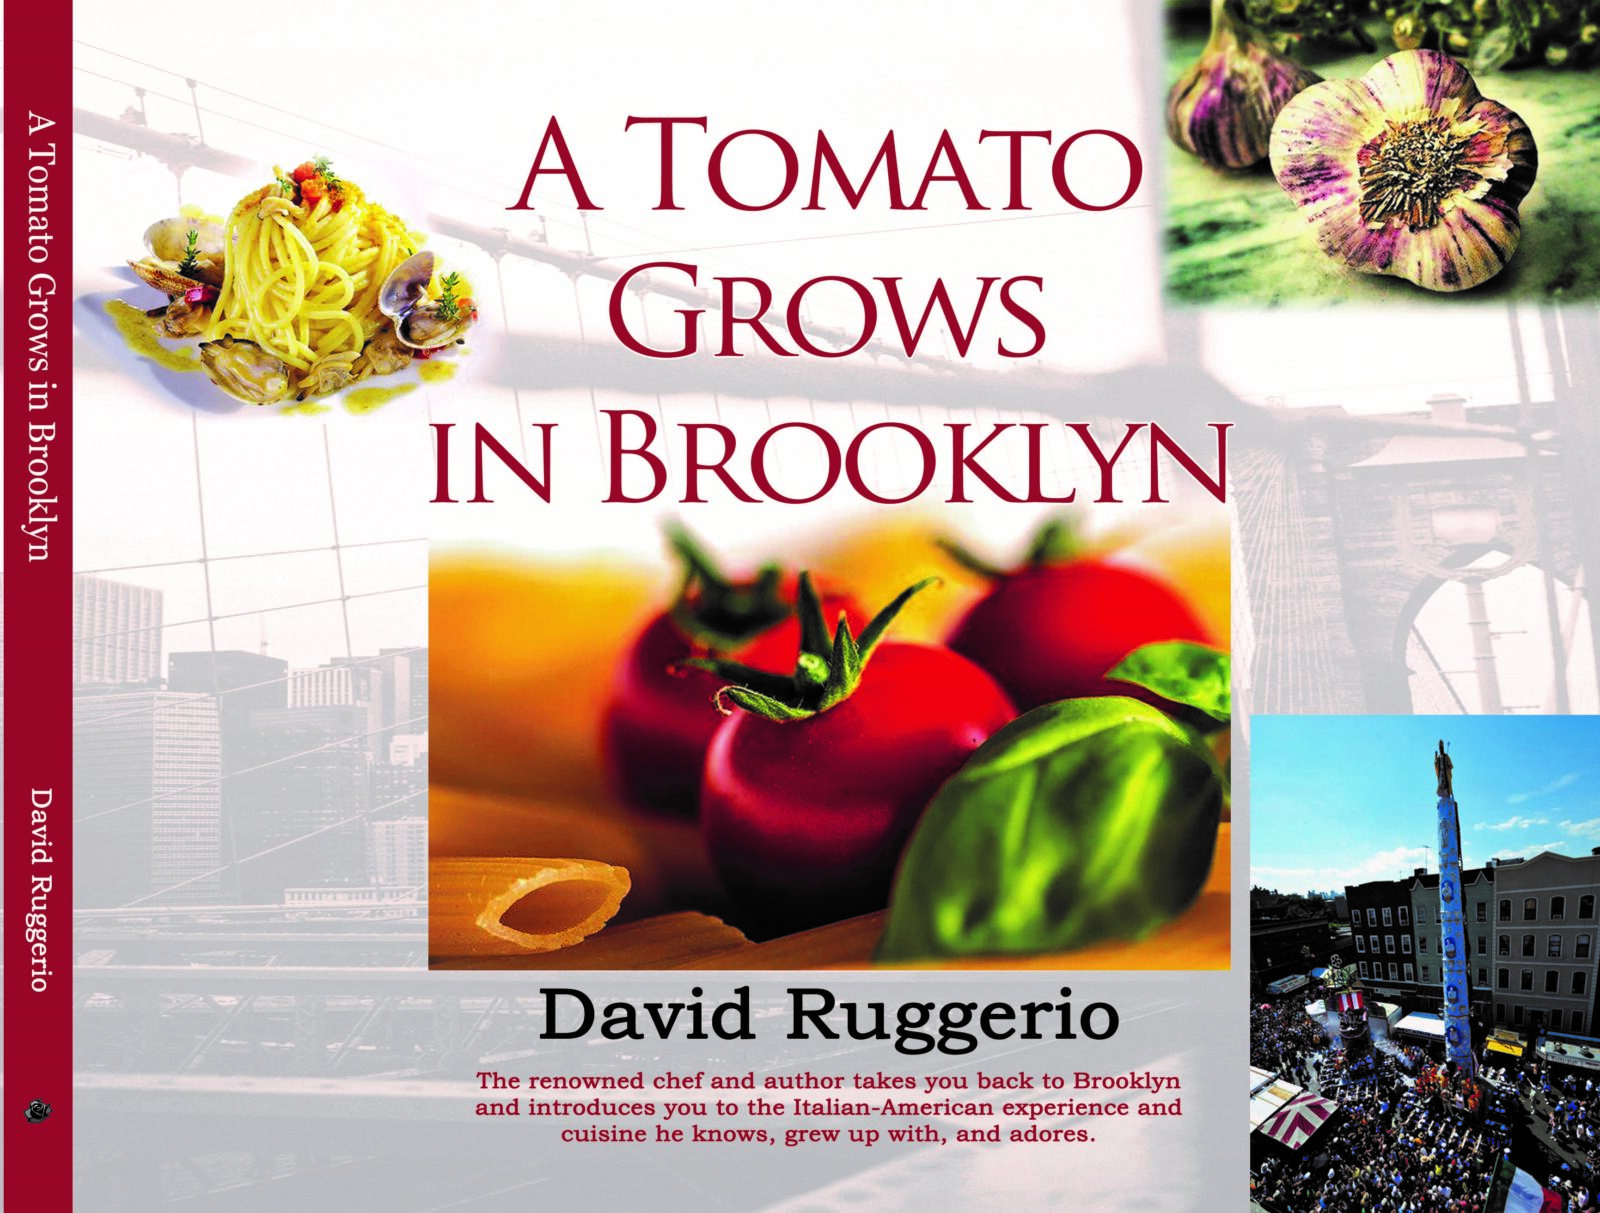 New Italian American Cookbook set to release